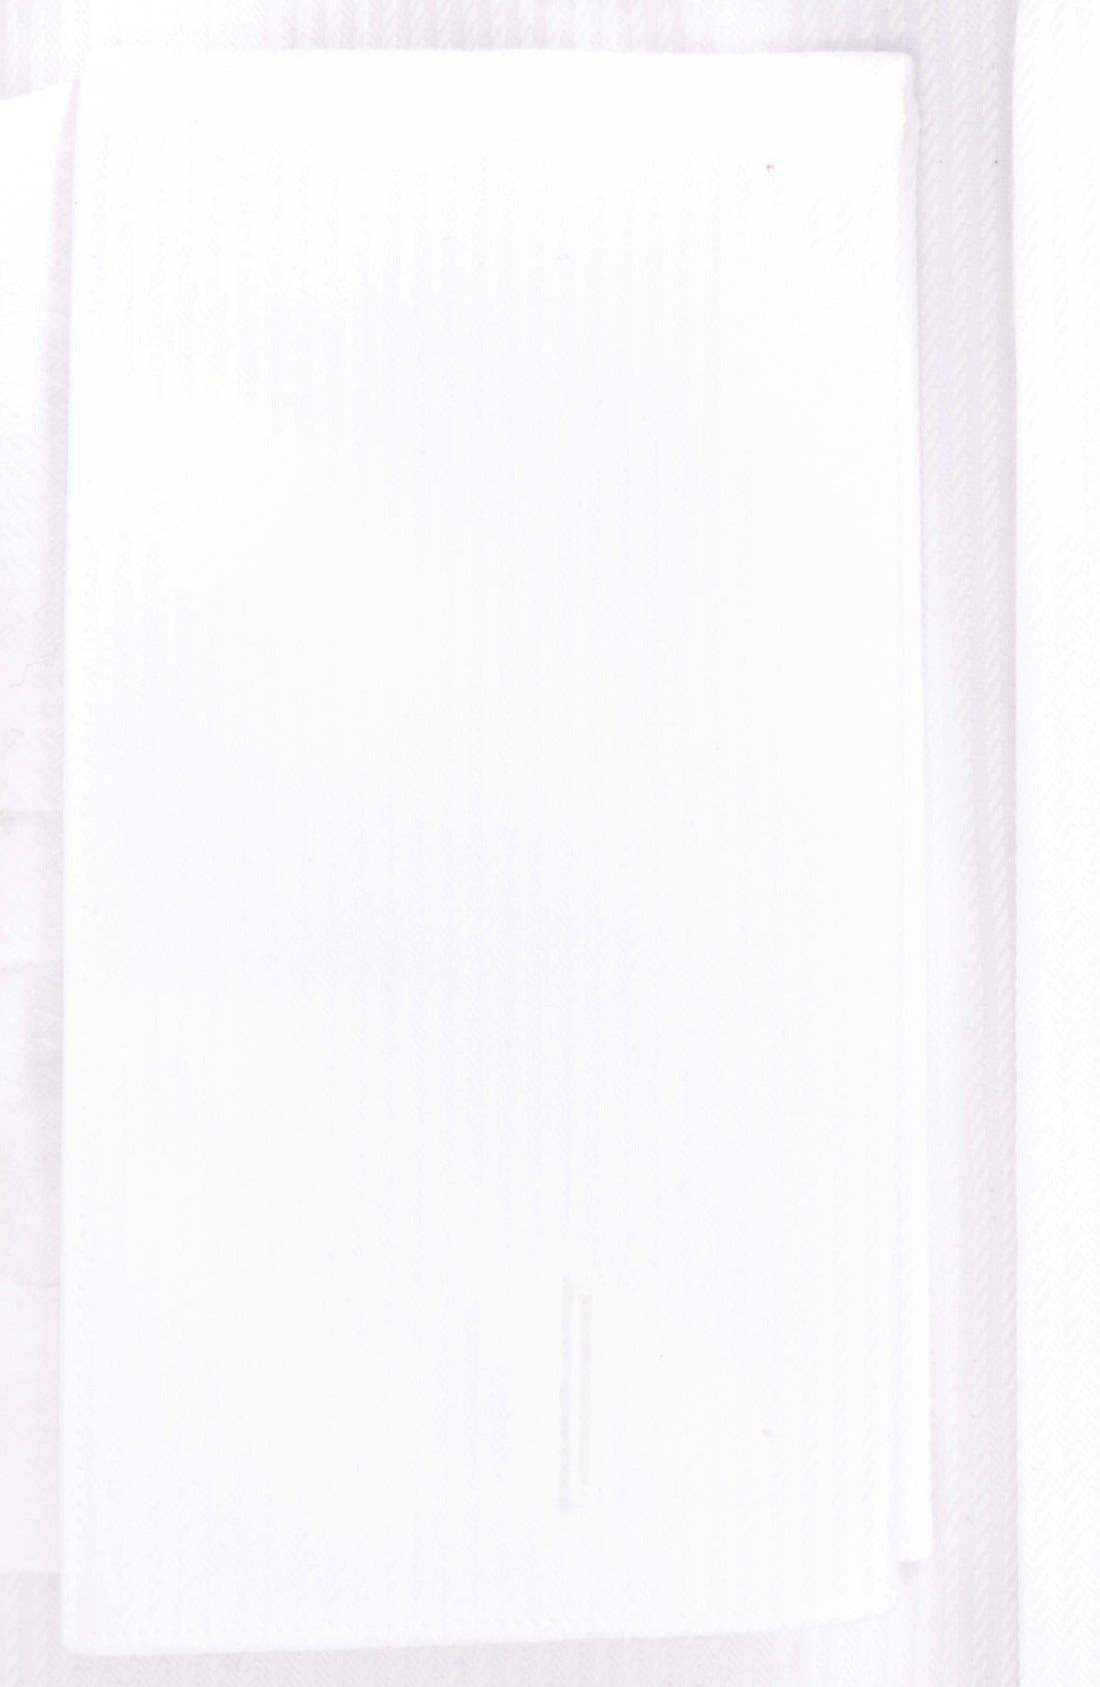 Alternate Image 2  - David Donahue Trim Fit Stripe Tuxedo Shirt